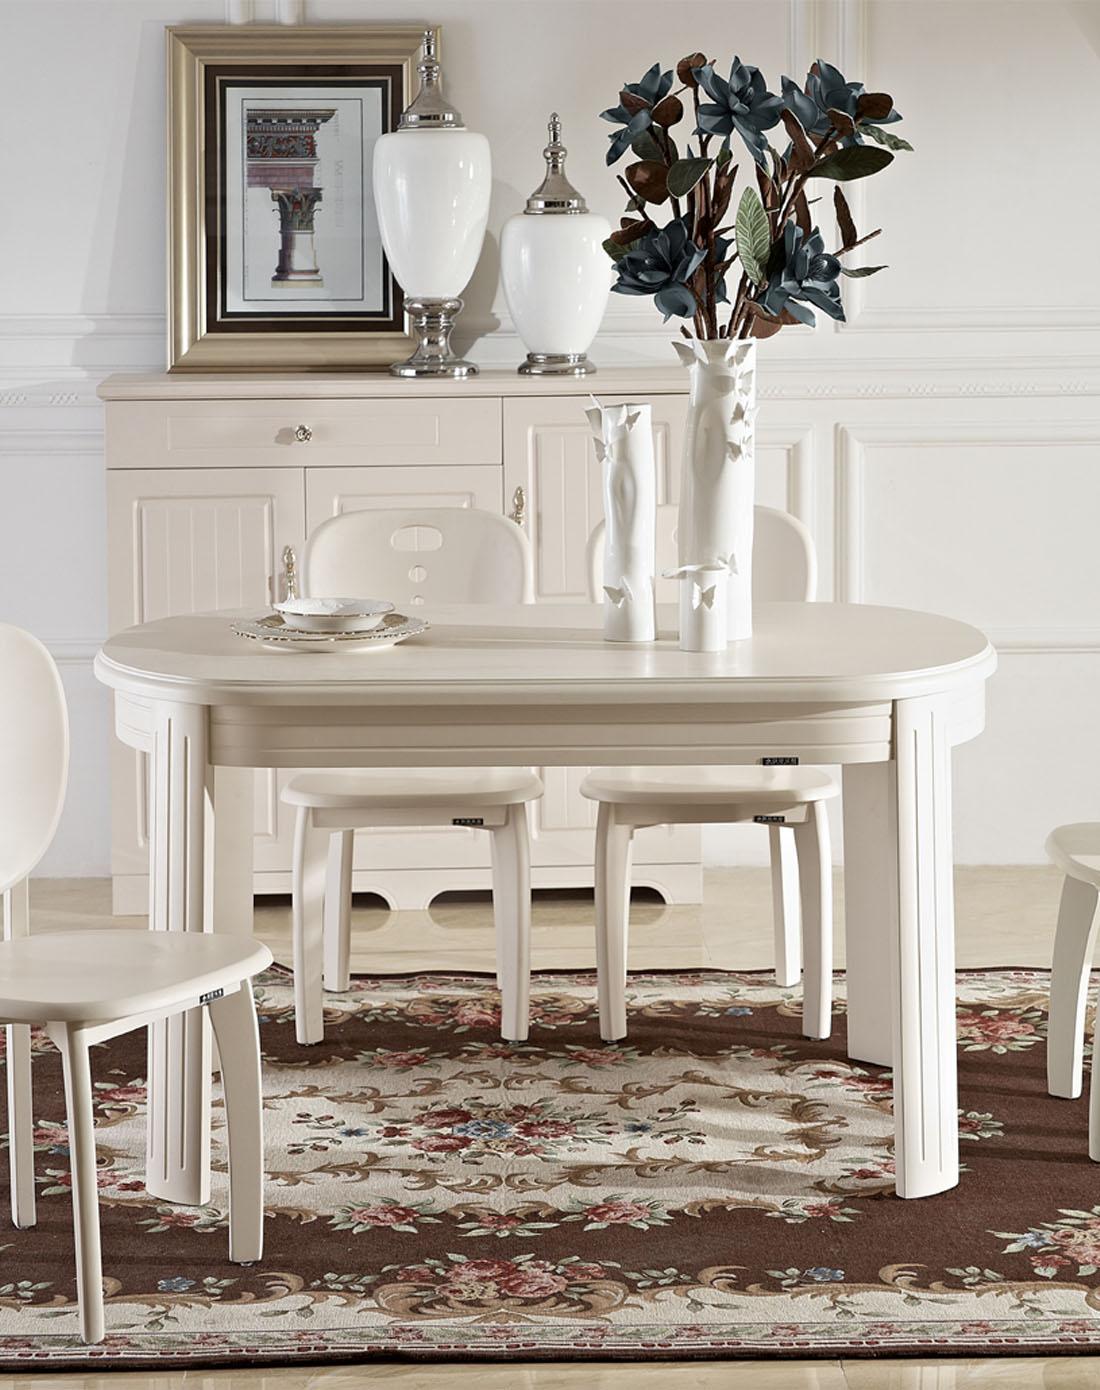 homes家具实木田园餐桌椅(一桌四椅)xhd